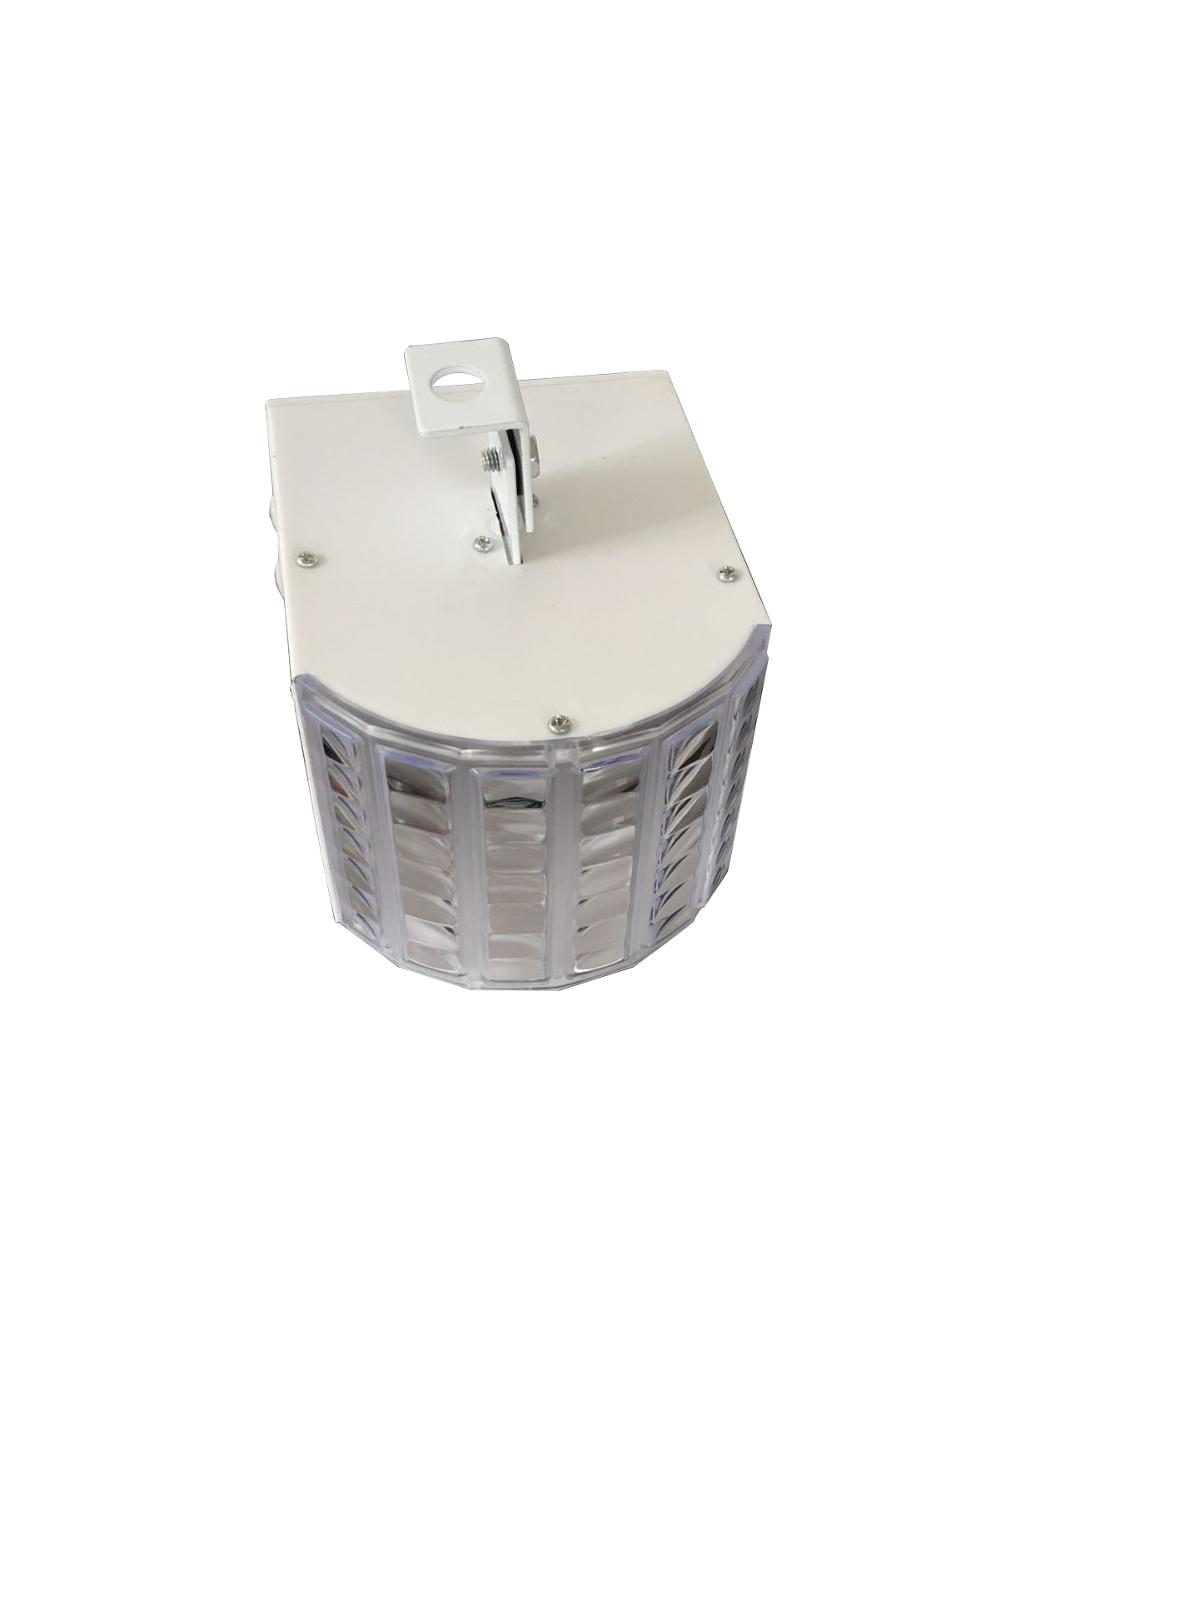 EXTREME HEX FLOWER 63 MINI LUCE A LED PER DISCOTECA 30 WATT + CONTROLLO DMX 6 CANALI_6